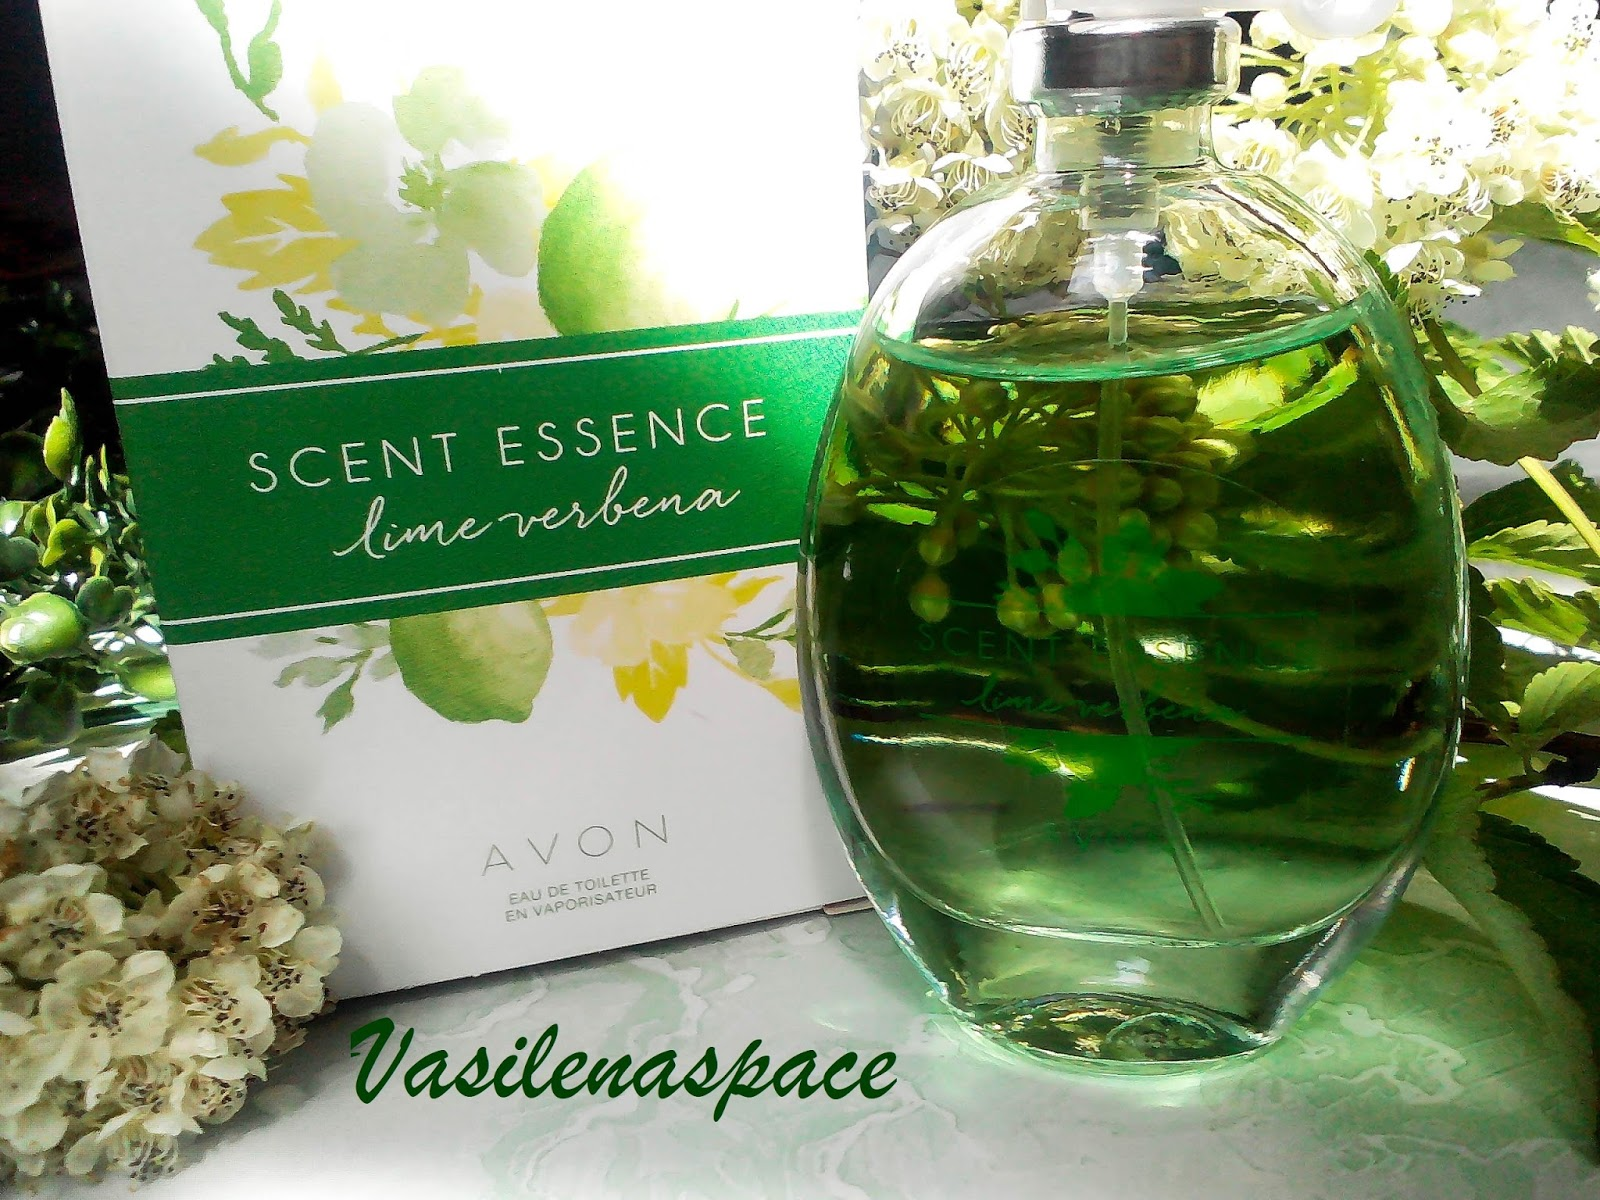 Bardzo dobry Освежающий лимонад - Avon Scent Essence Lime Verbena. QA76